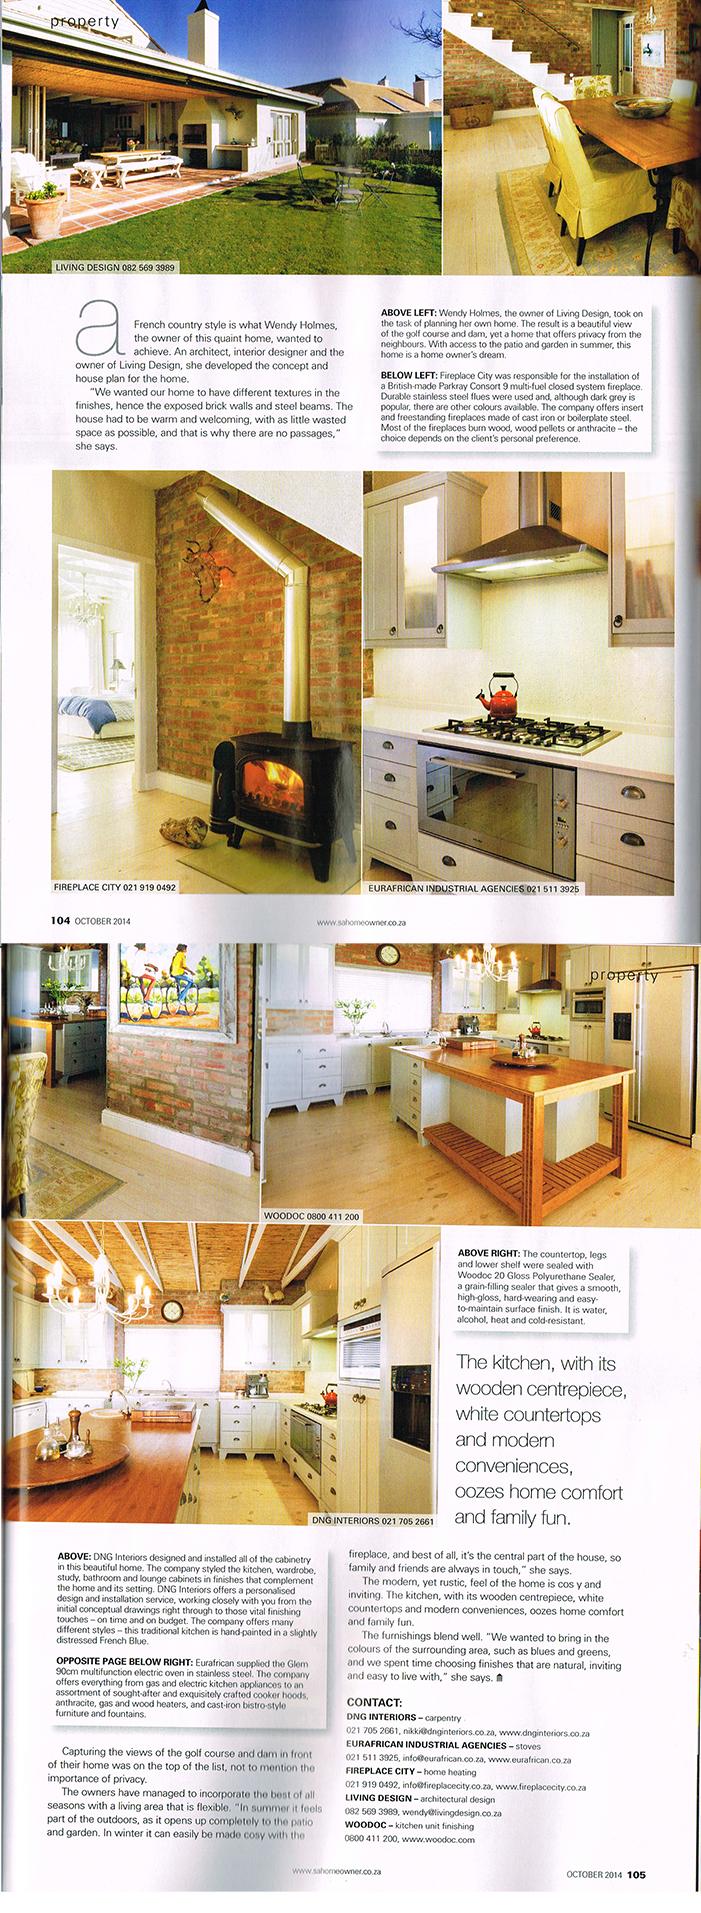 Langebaan Country Estate Living Design Home Renovation Electrical Installation Upgrade Importance Renovations